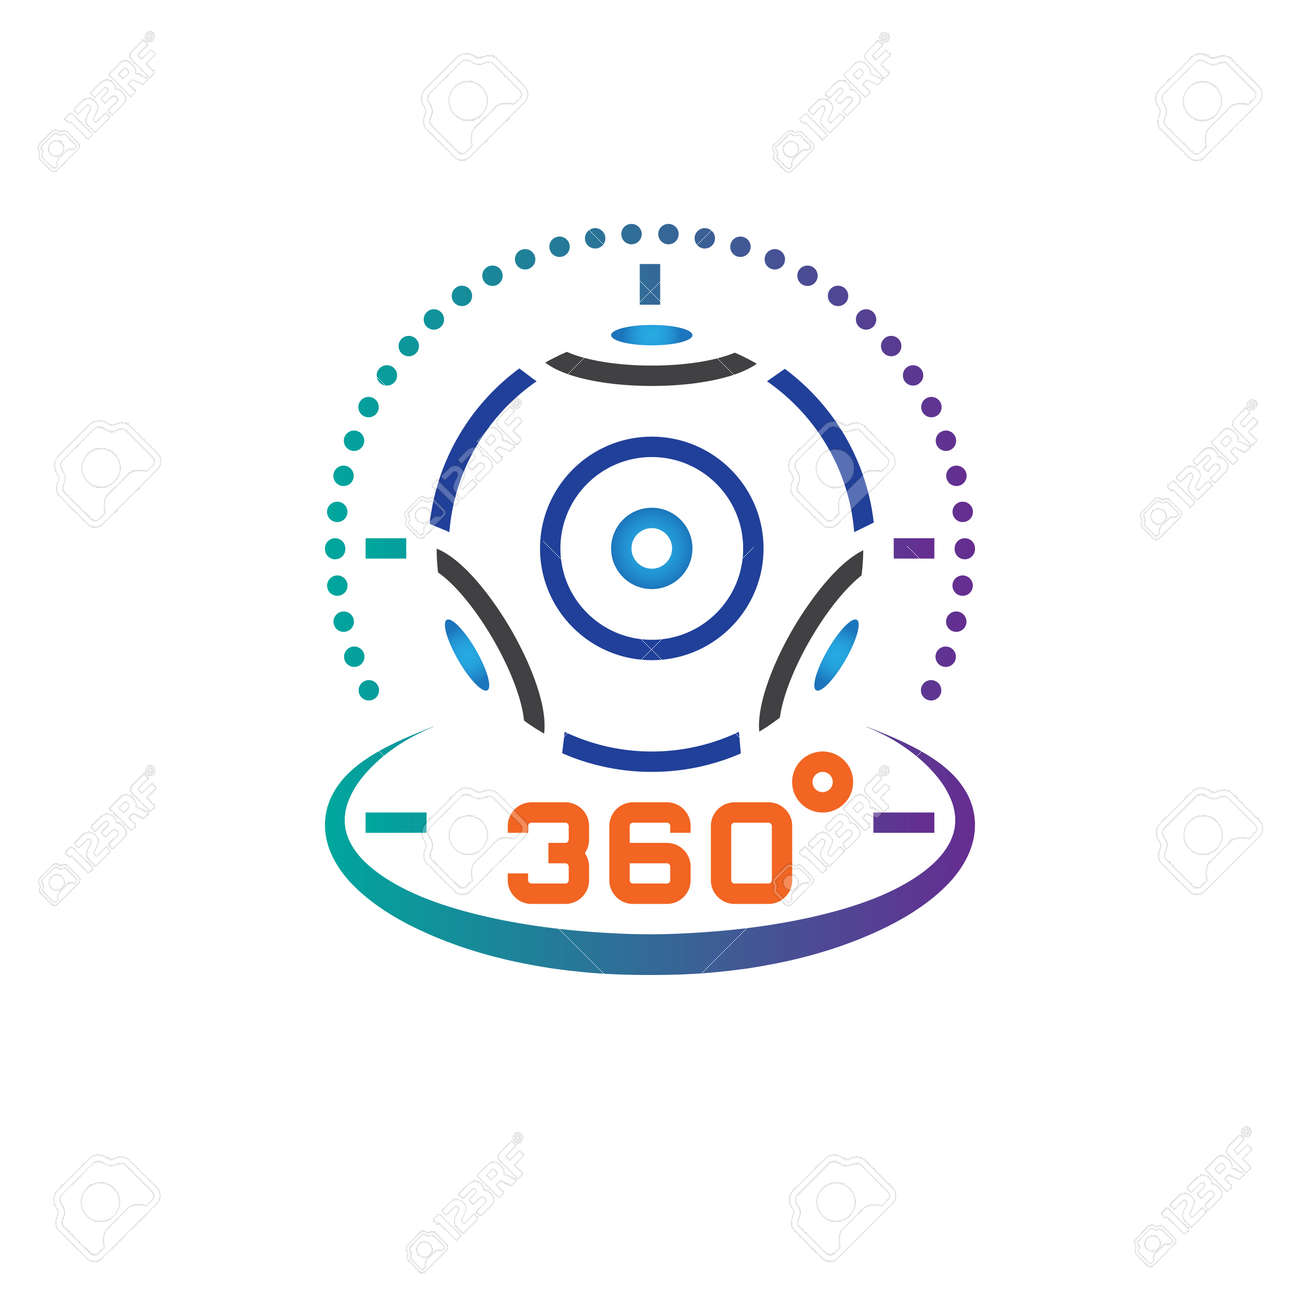 360 degree panoramic video camera line icon, virtual reality